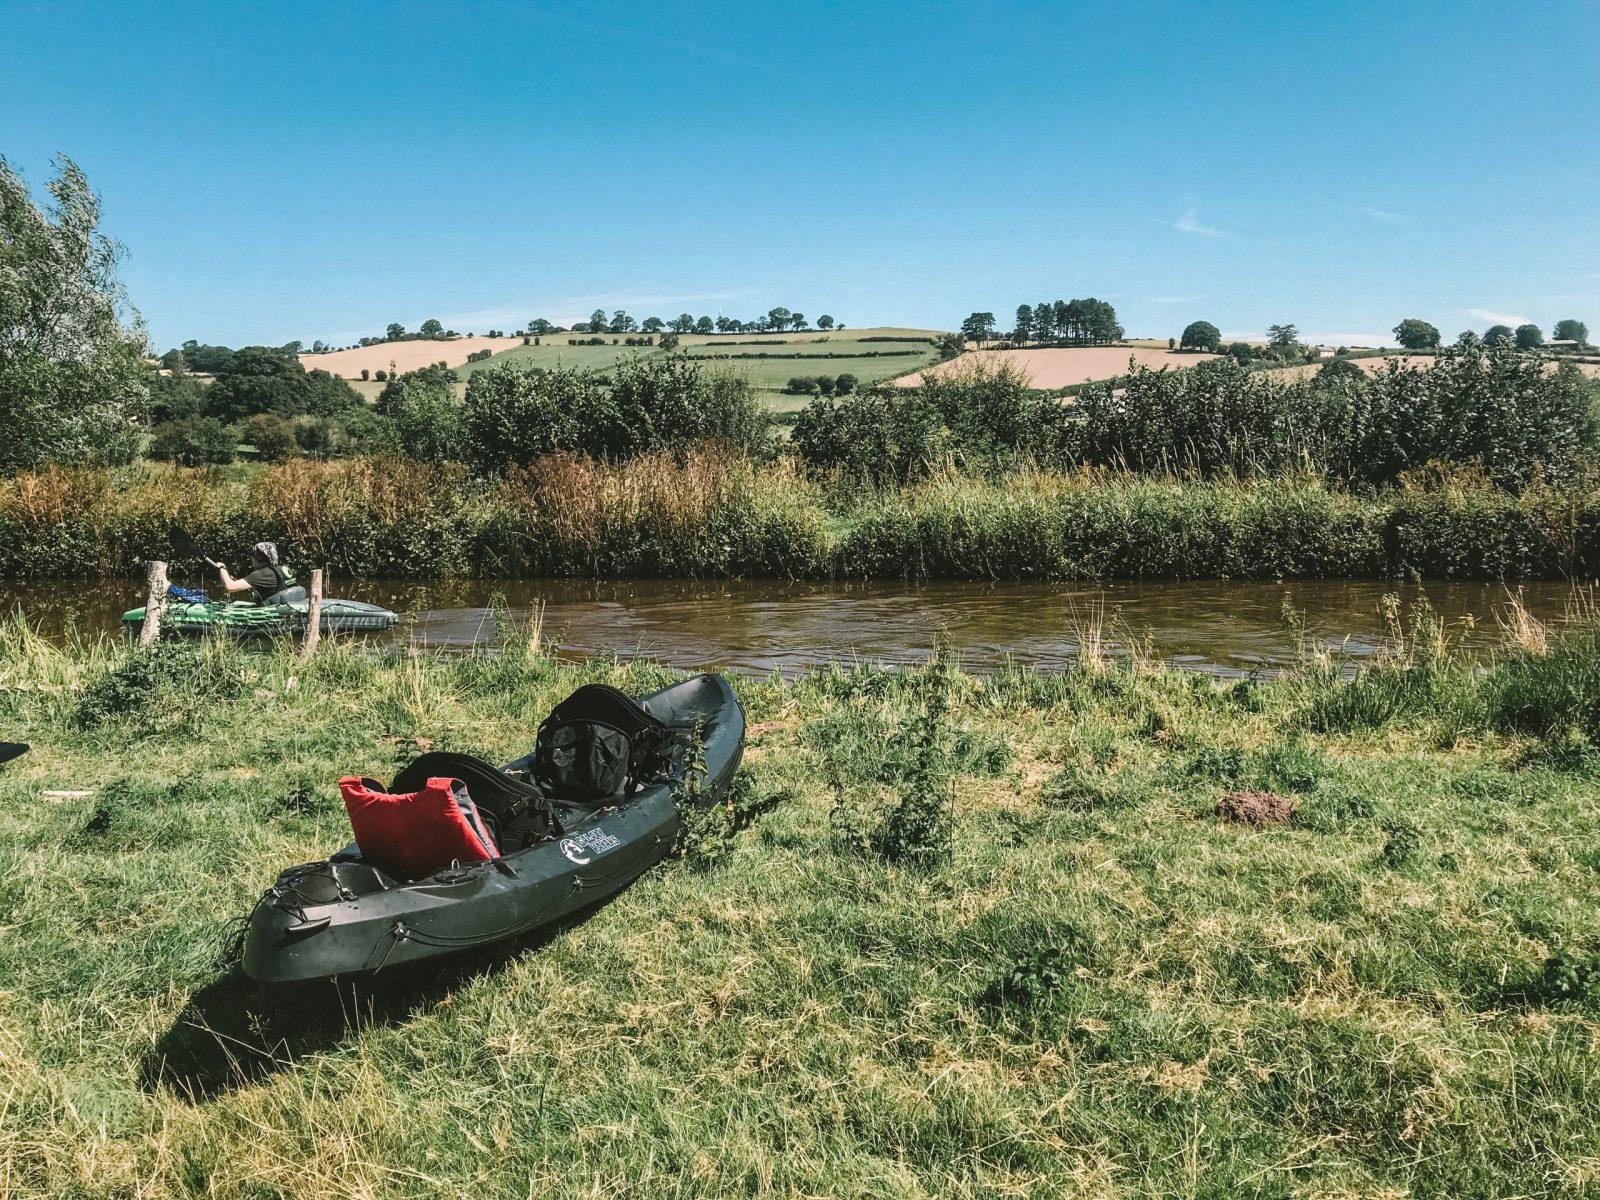 Beginners guide to kayaking